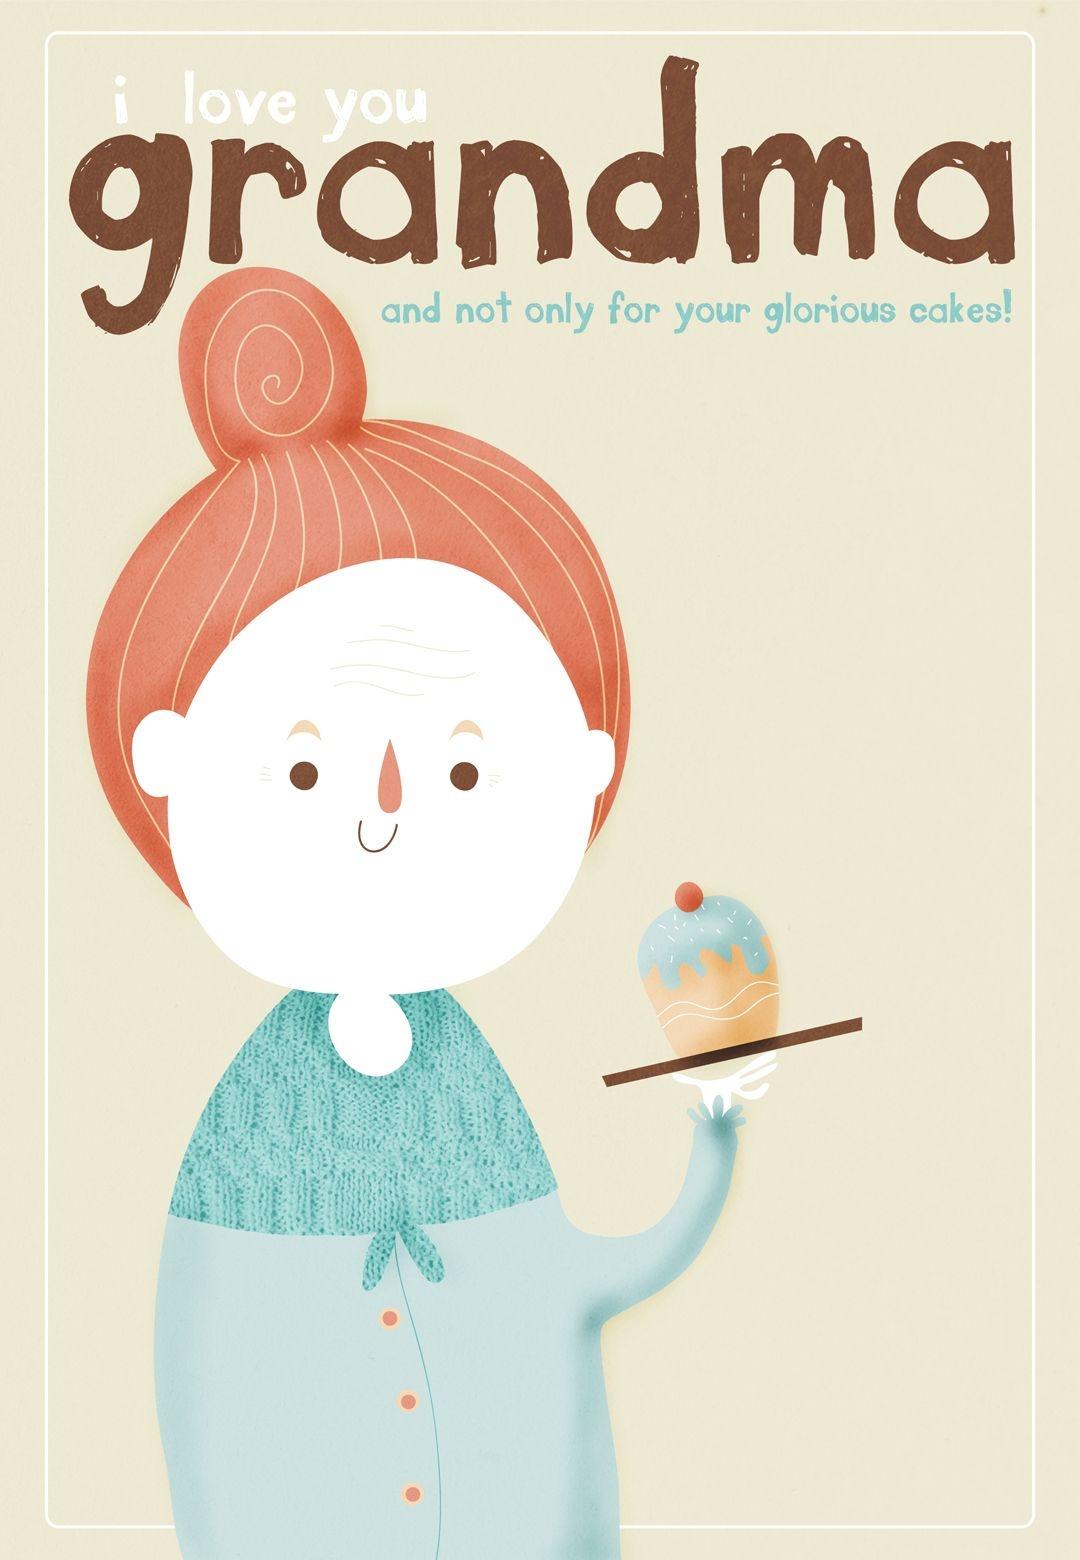 Free Printable I Love You Grandma Greeting Card   Grandparents Day - Grandparents Day Cards Printable Free